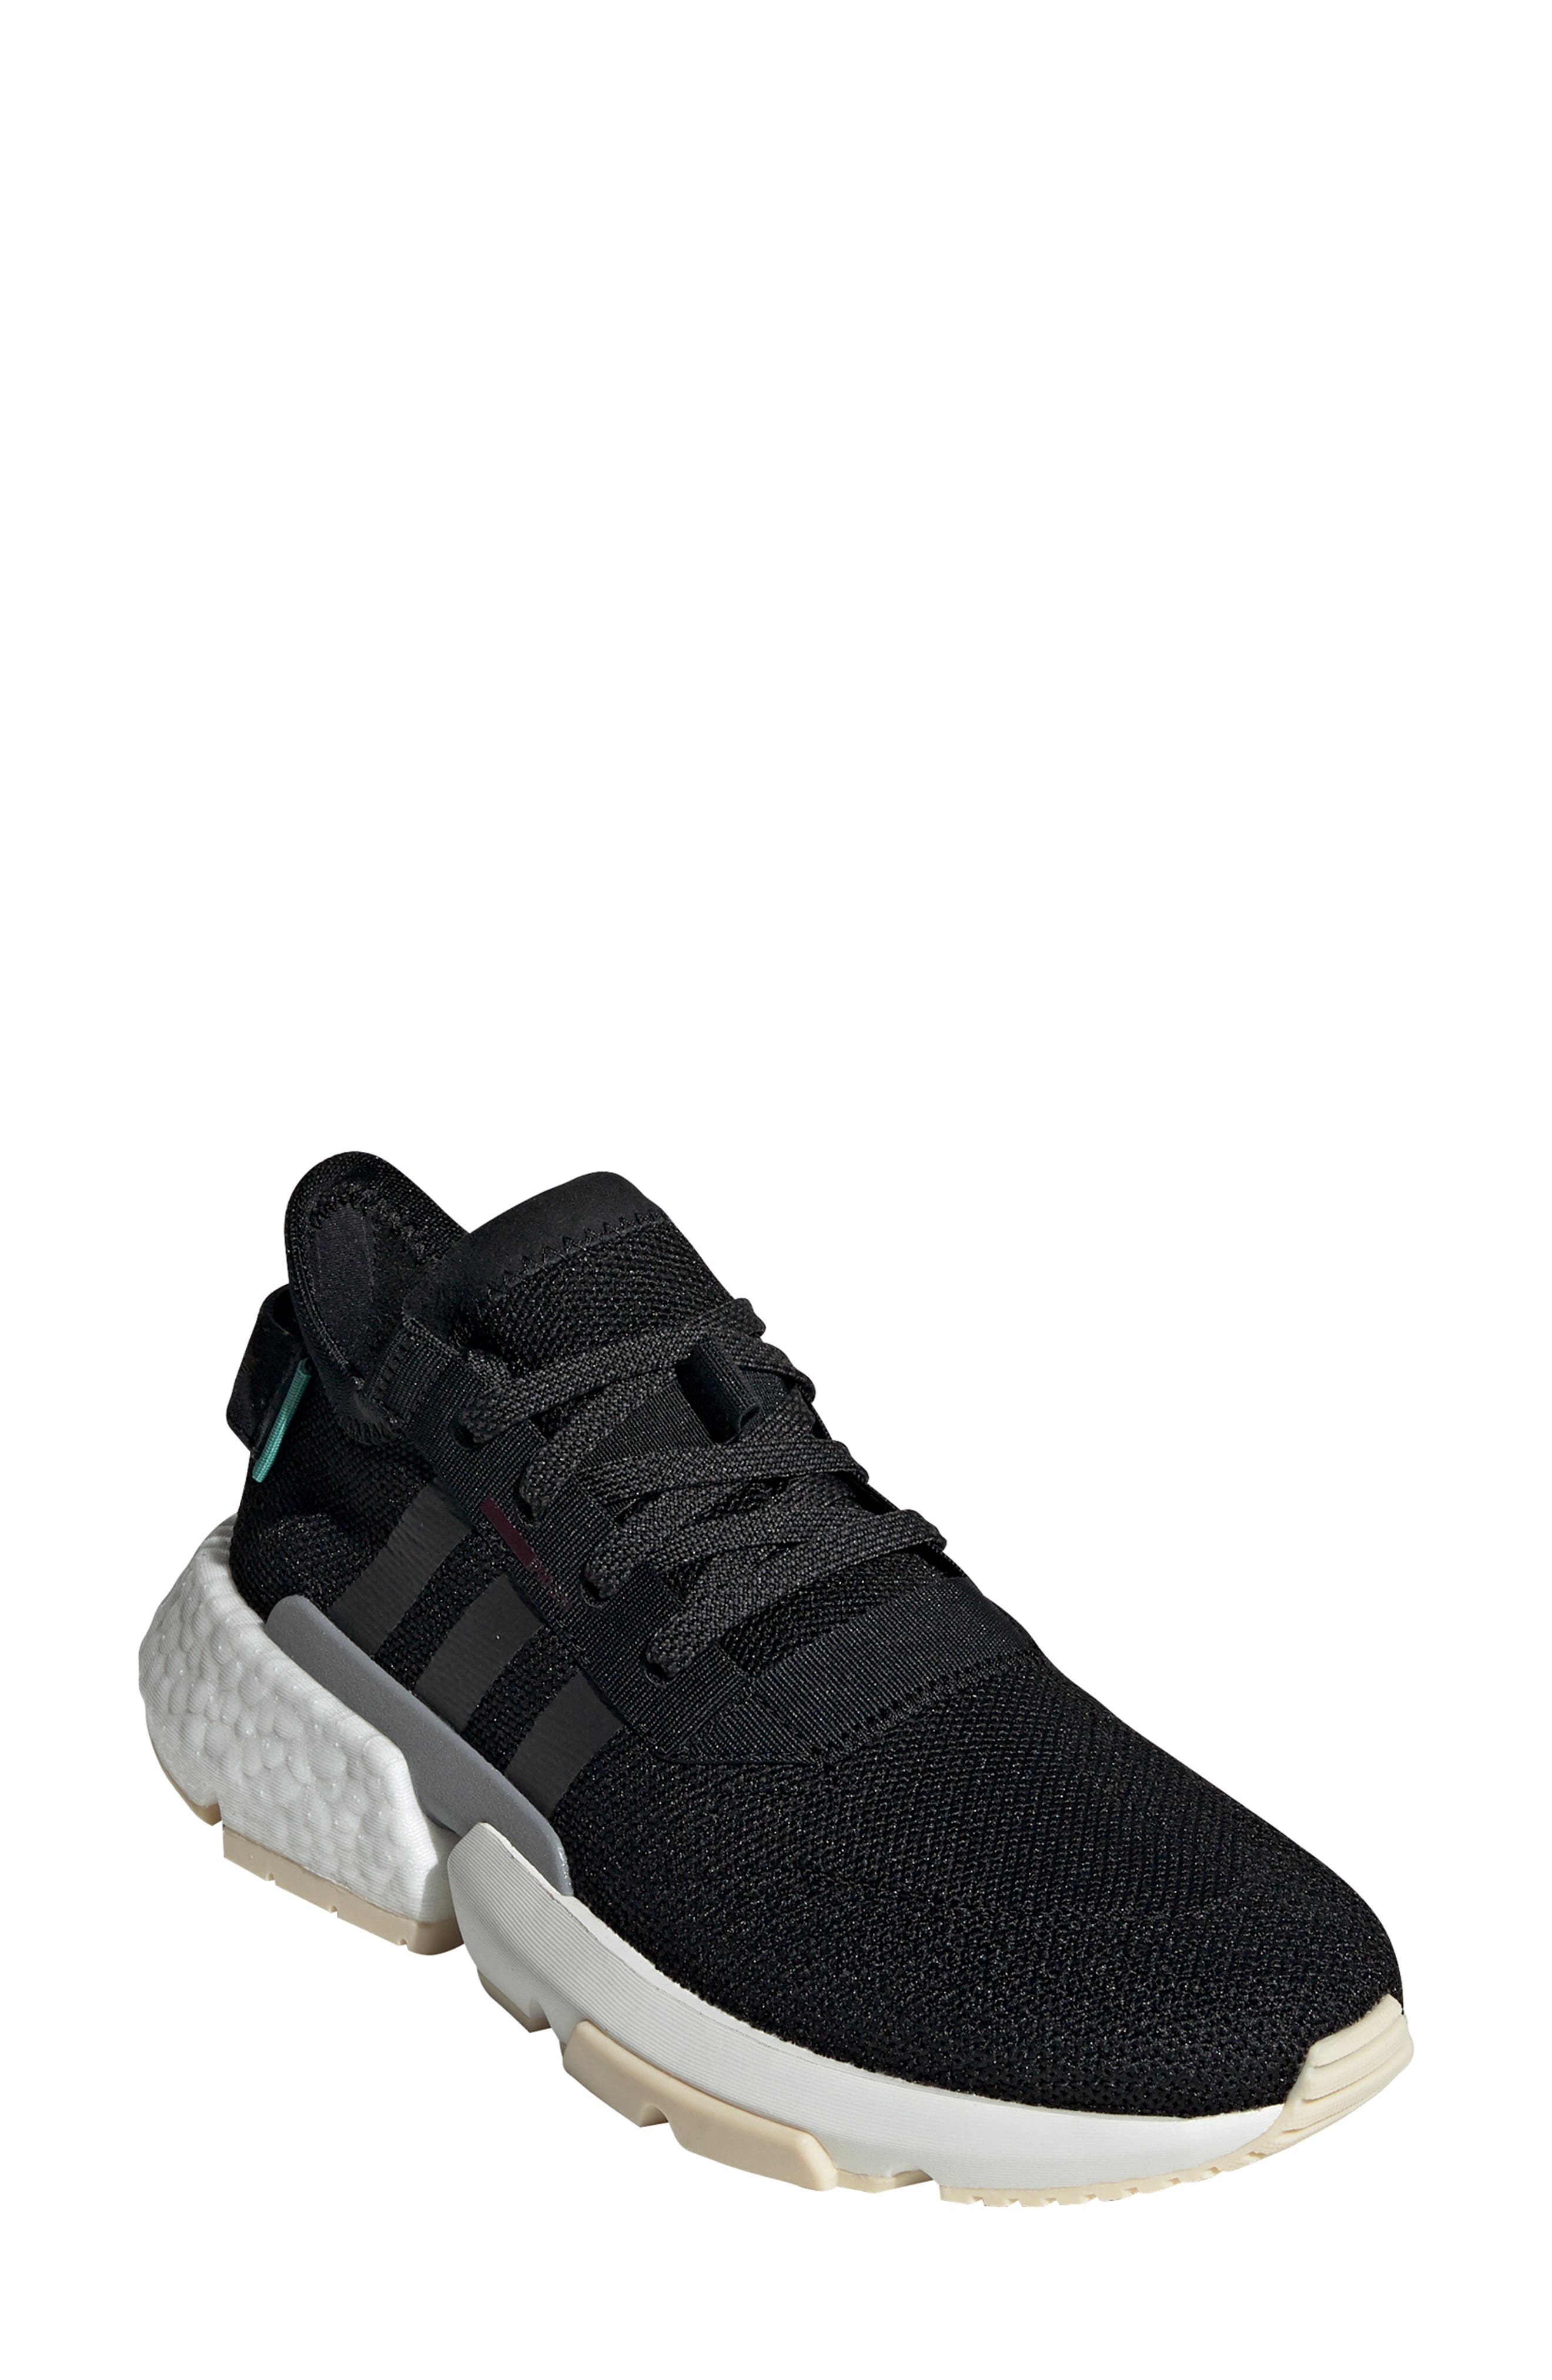 0d776297b adidas boost